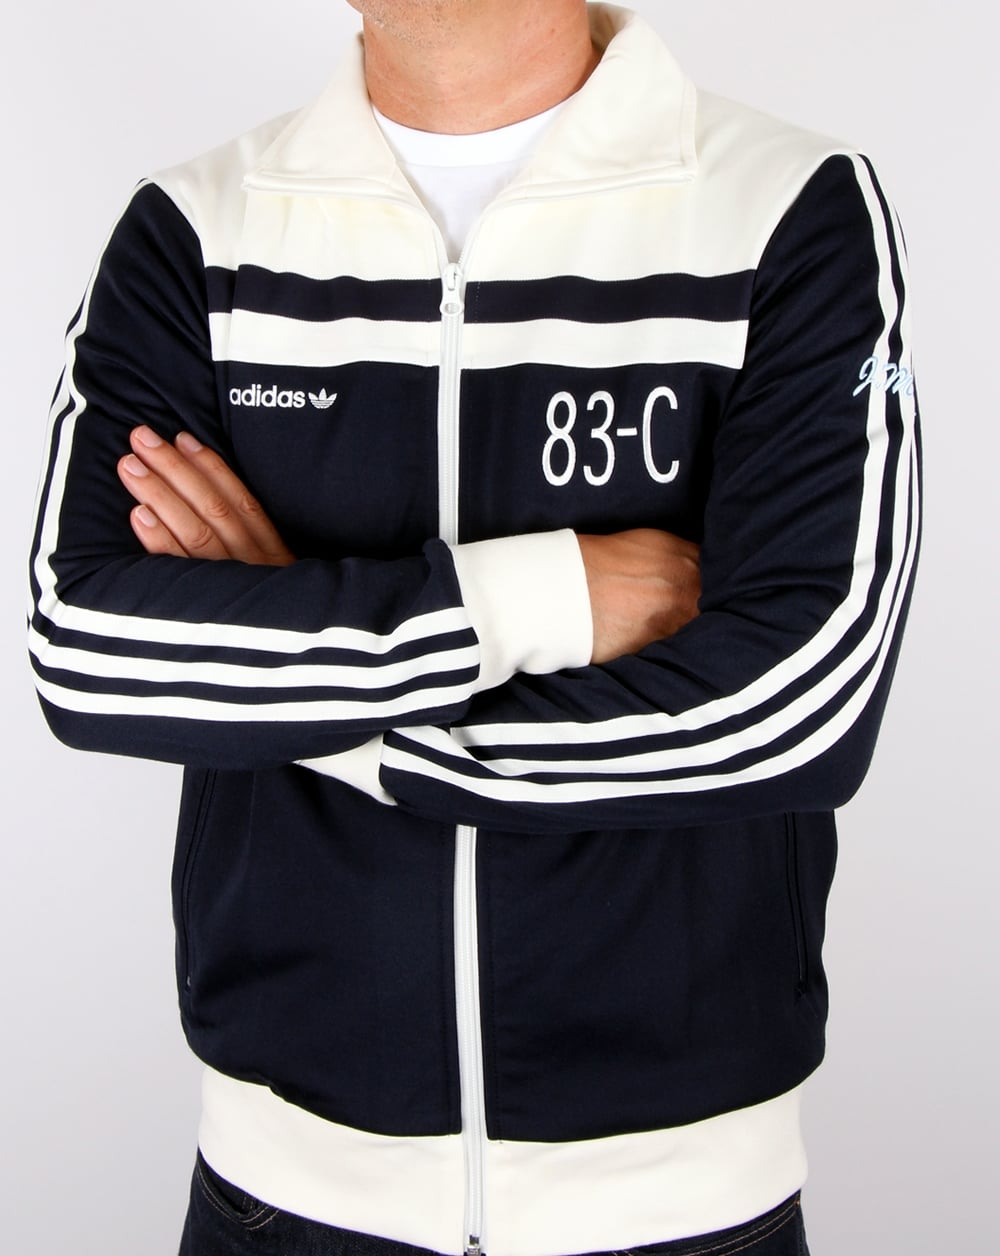 Adidas Top Ten Hi Sleek Bow Zip Trainers: Adidas Originals 83-C Track Top Navy/Off White,tracksuit